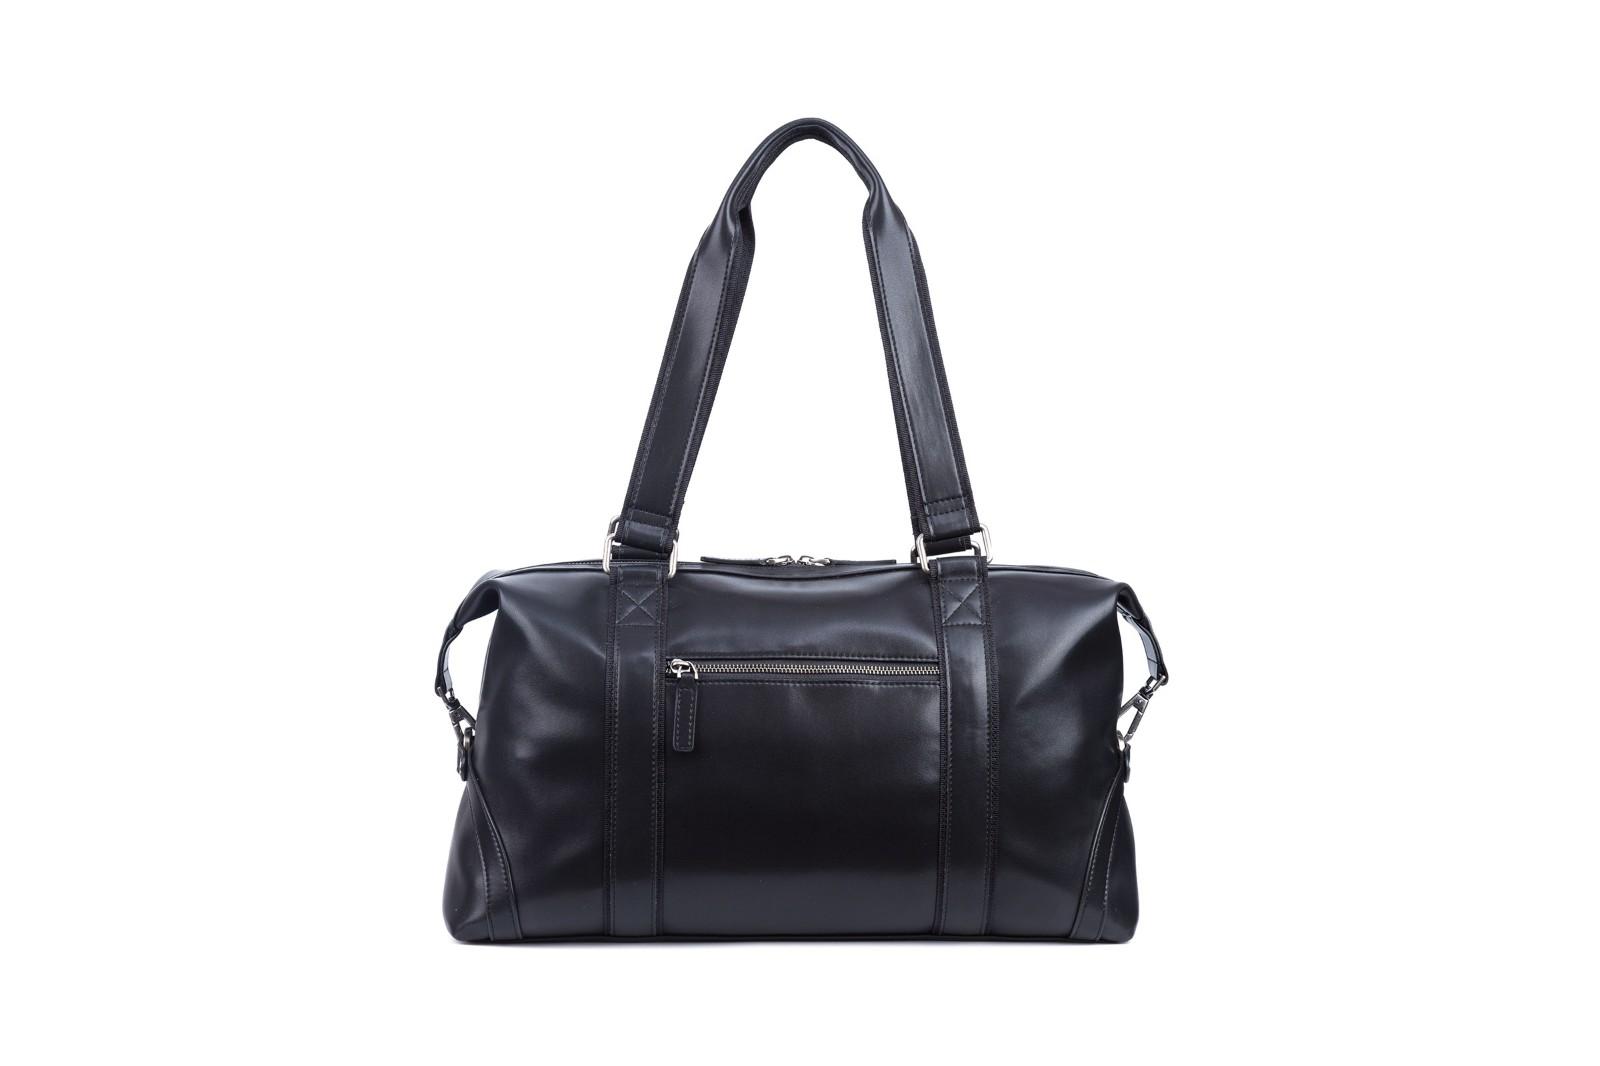 GF bags-Leather Duffle Bag Mens Duffle Leather Handle Metal Zipper Closure